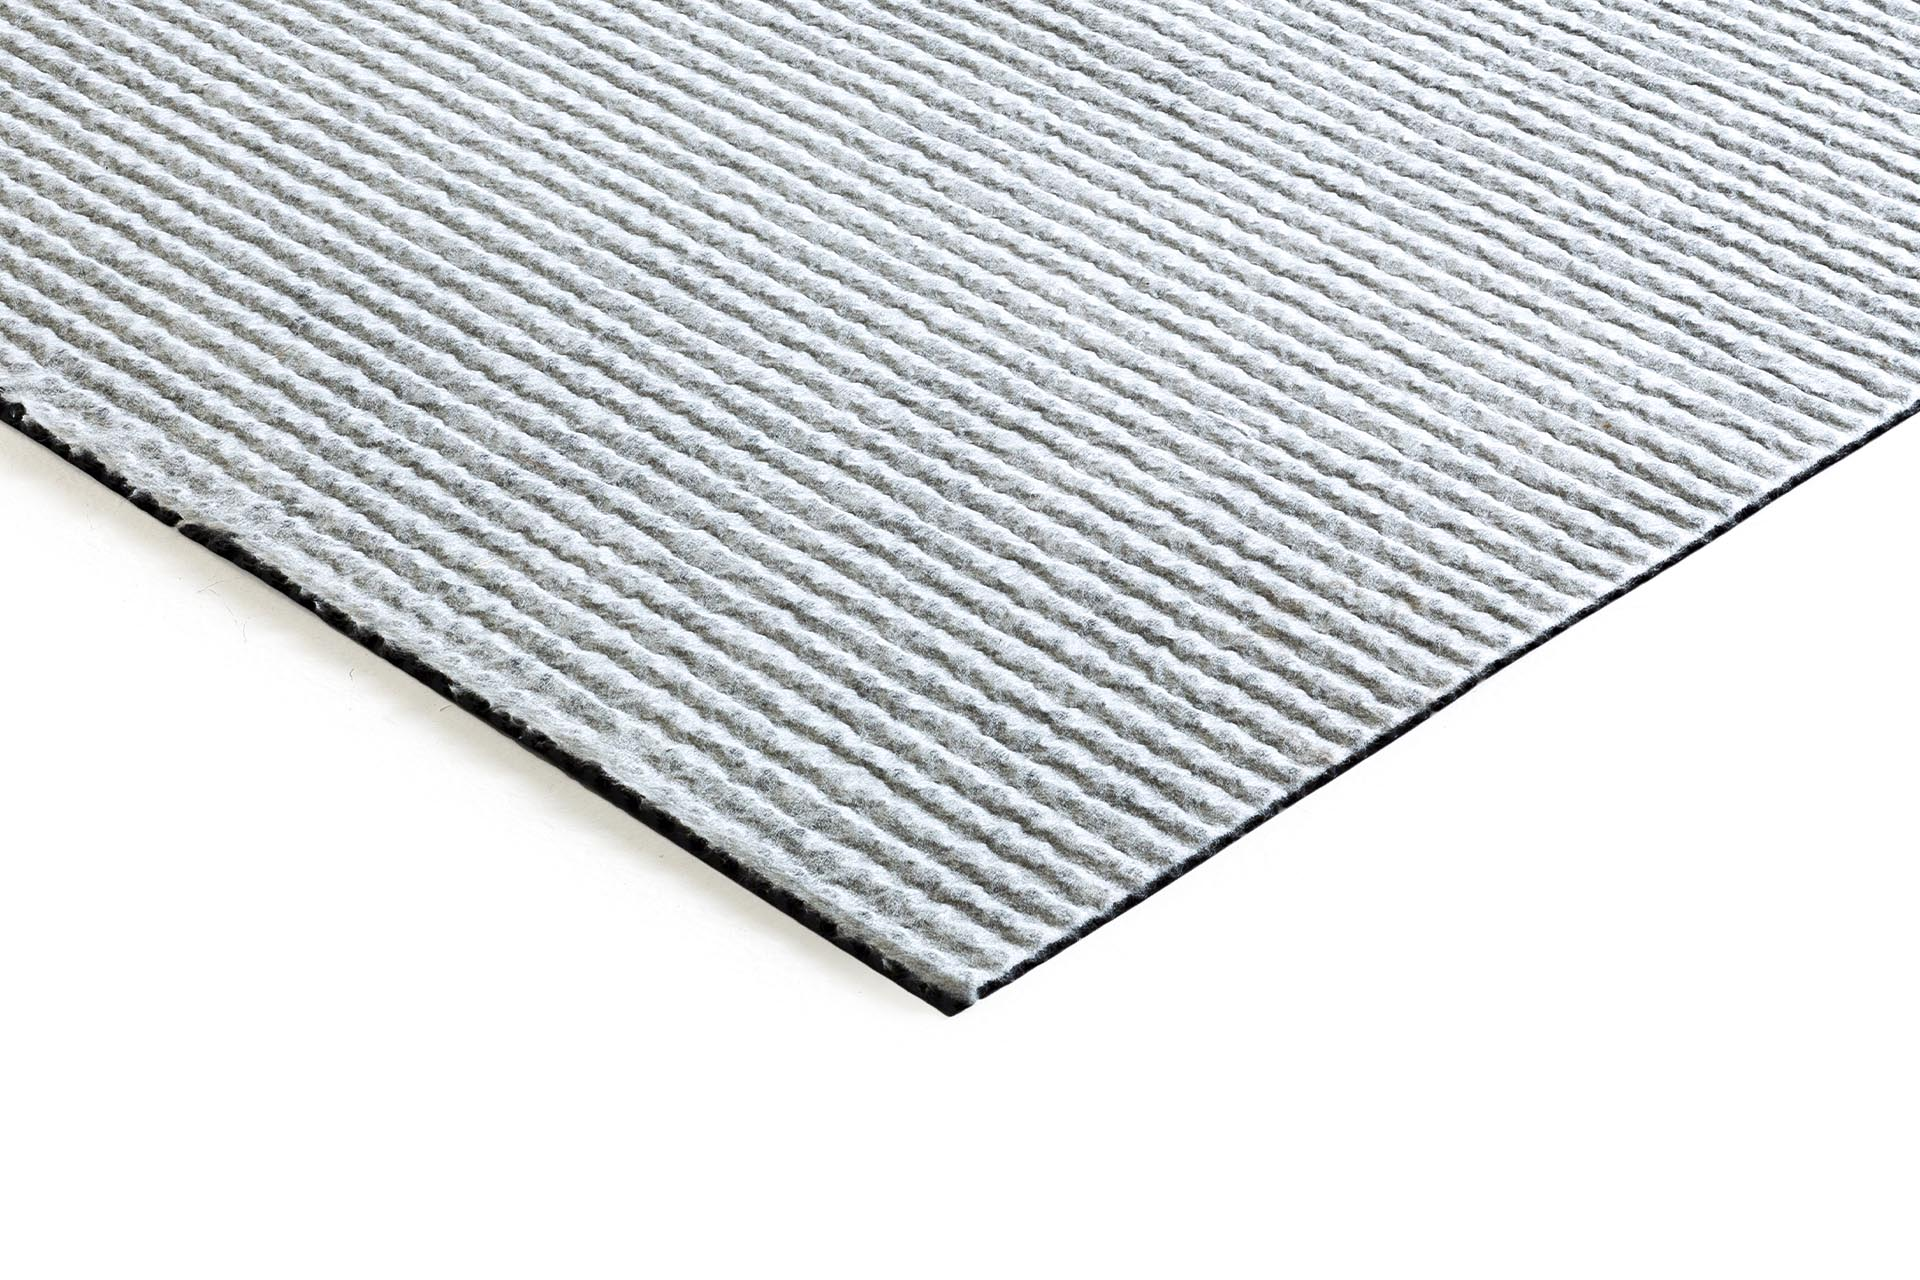 Highly density polyethylene (HDPE) studded membrane, bonded to a filter geotextile